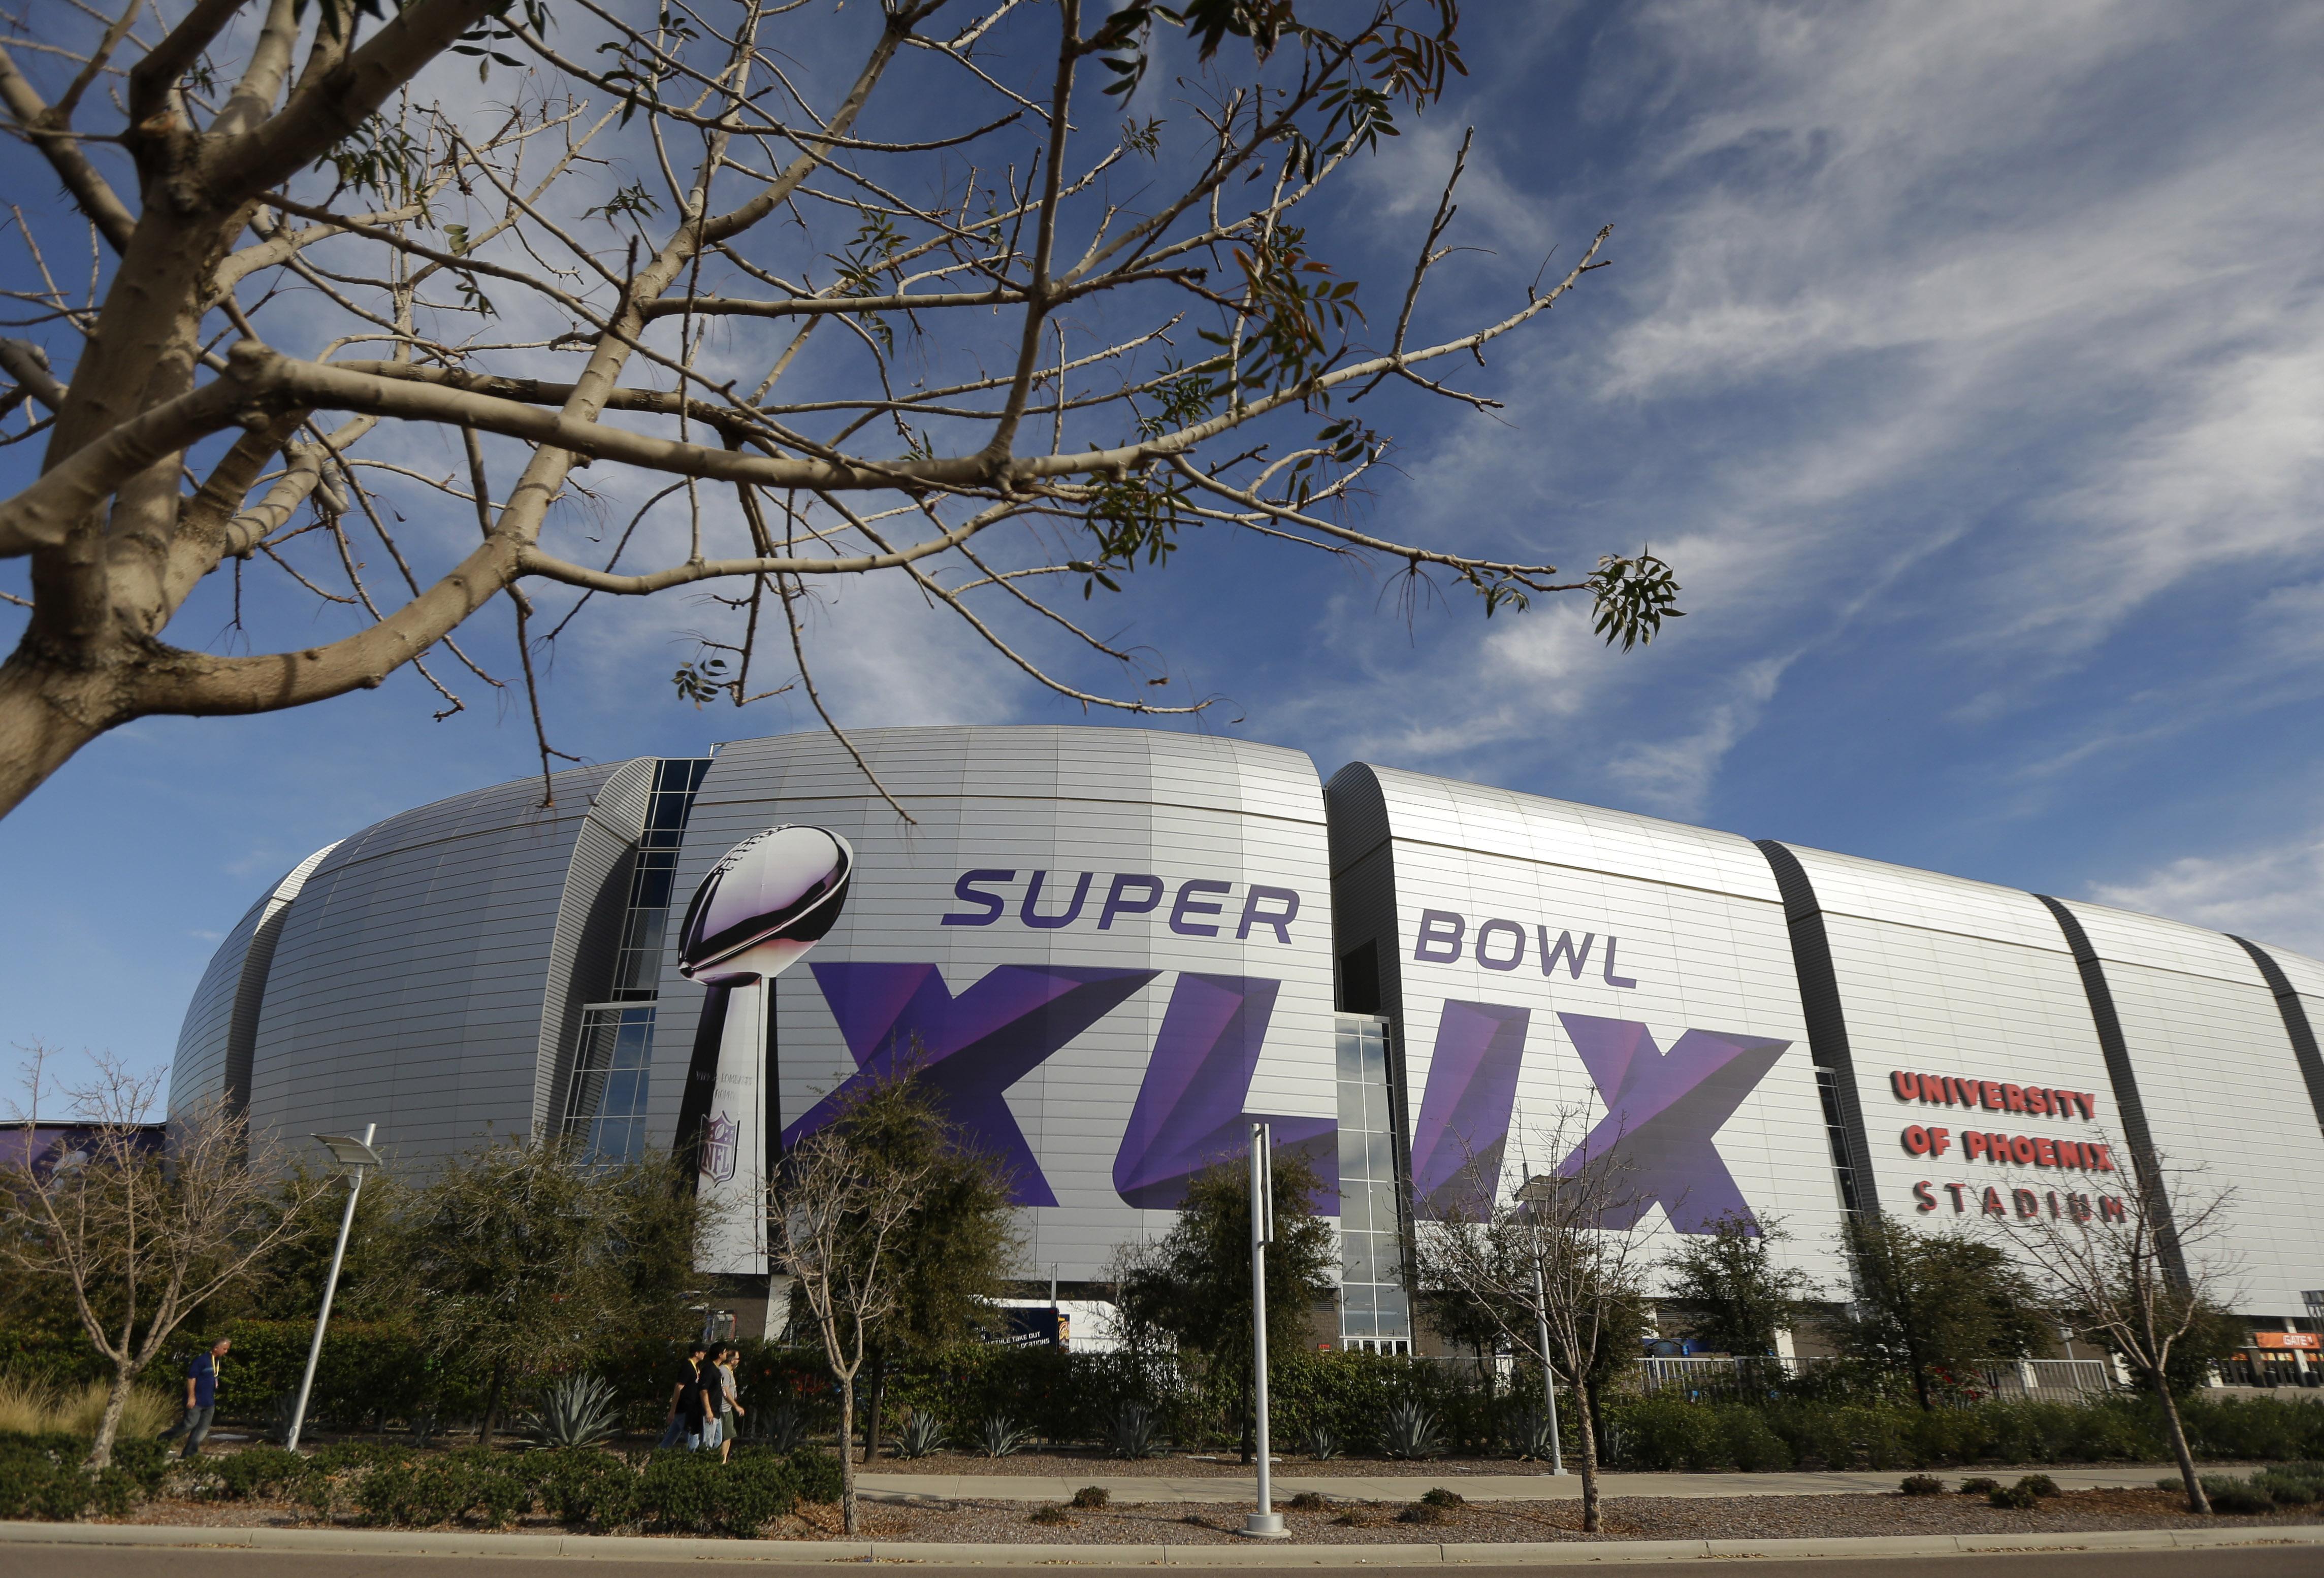 The University of Phoenix Stadium in Glendale, Ariz, where Super Bowl XLIX will take place on Feb. 1, 2015.